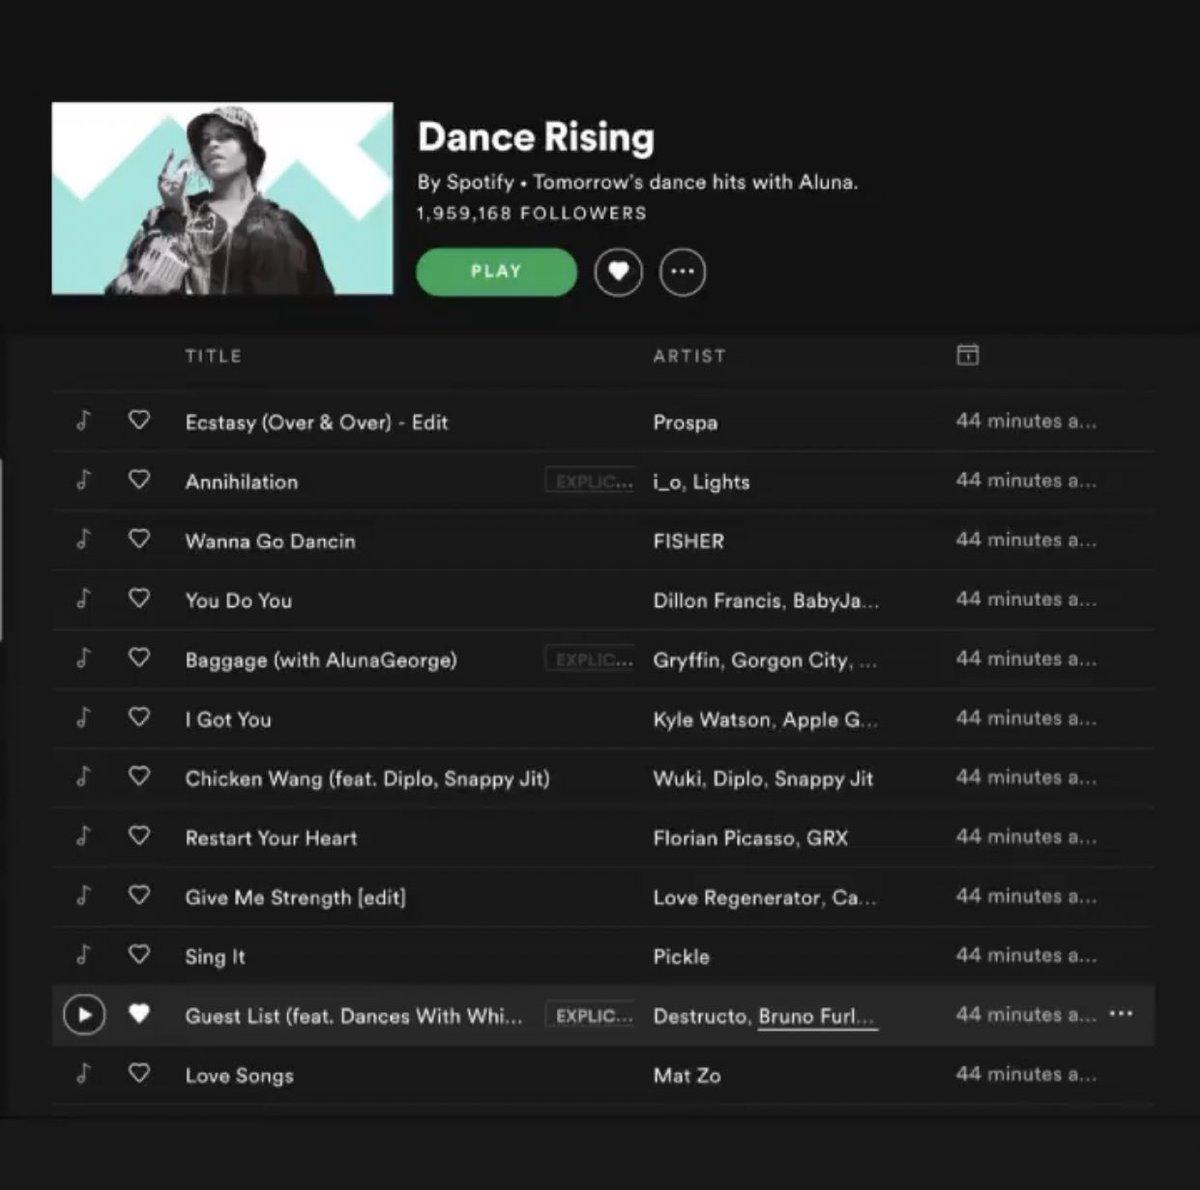 39º #BASSHOUSE on @beatport  #DanceRising on @Spotify   @destructoamf, & @djbrunofurlan - Guest List (Ft @dances)  🏅🔥